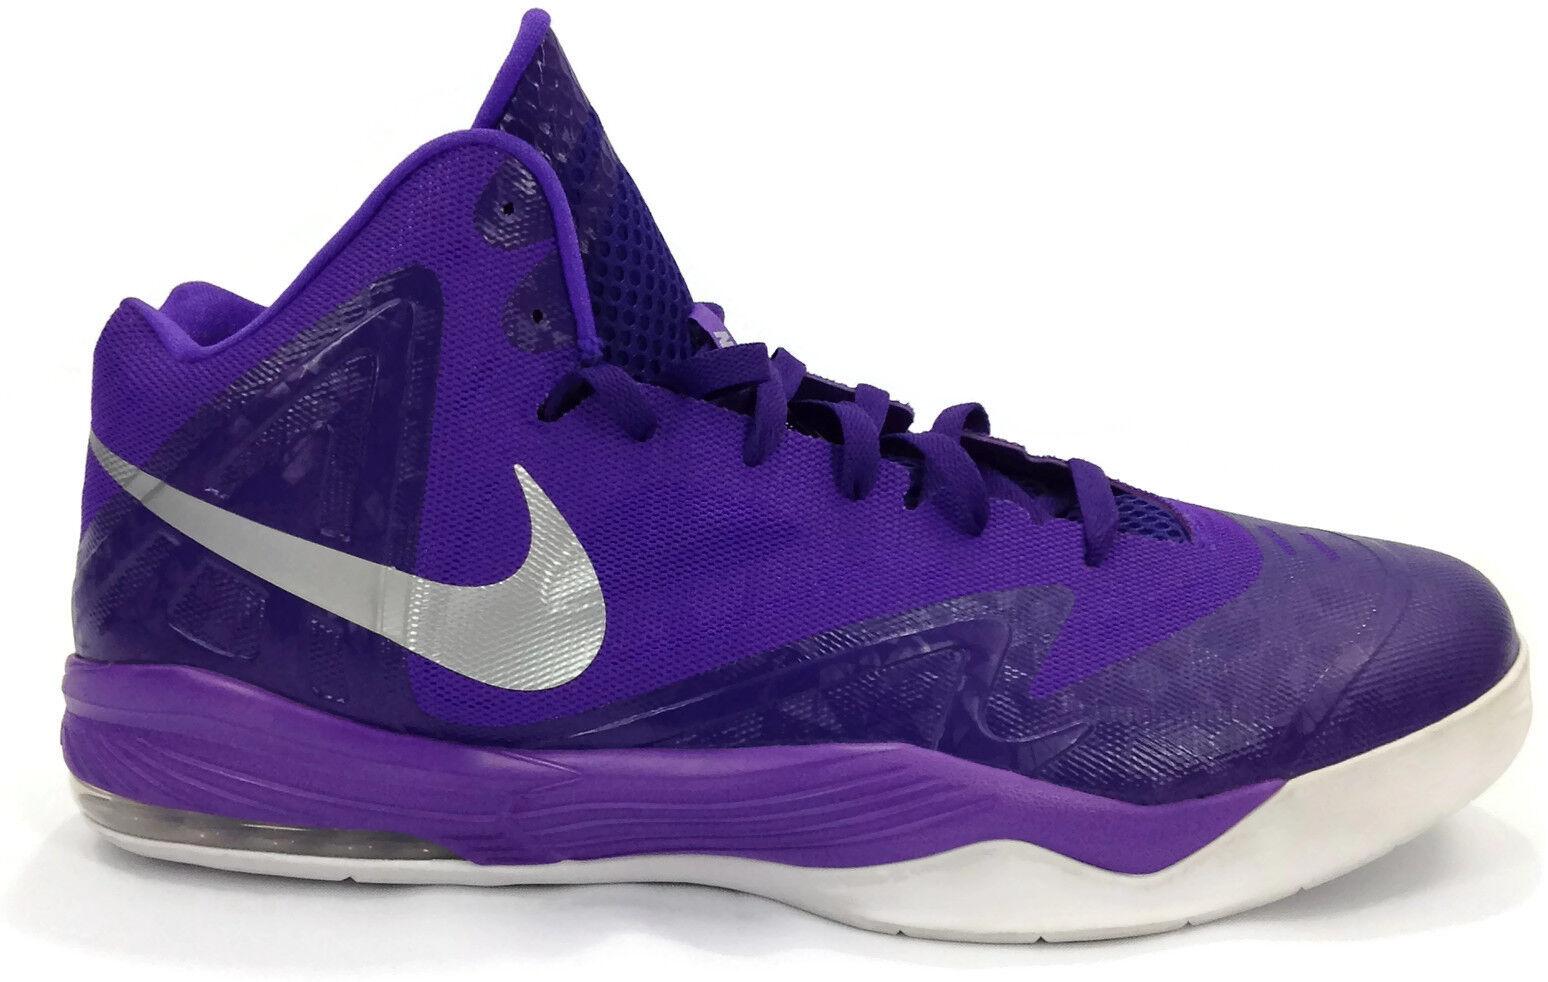 Nike Air Max Premiere TB Basketball Shoes Uomo Size Size Uomo 17.5 Purple 685775-505 NWOB 4c086e